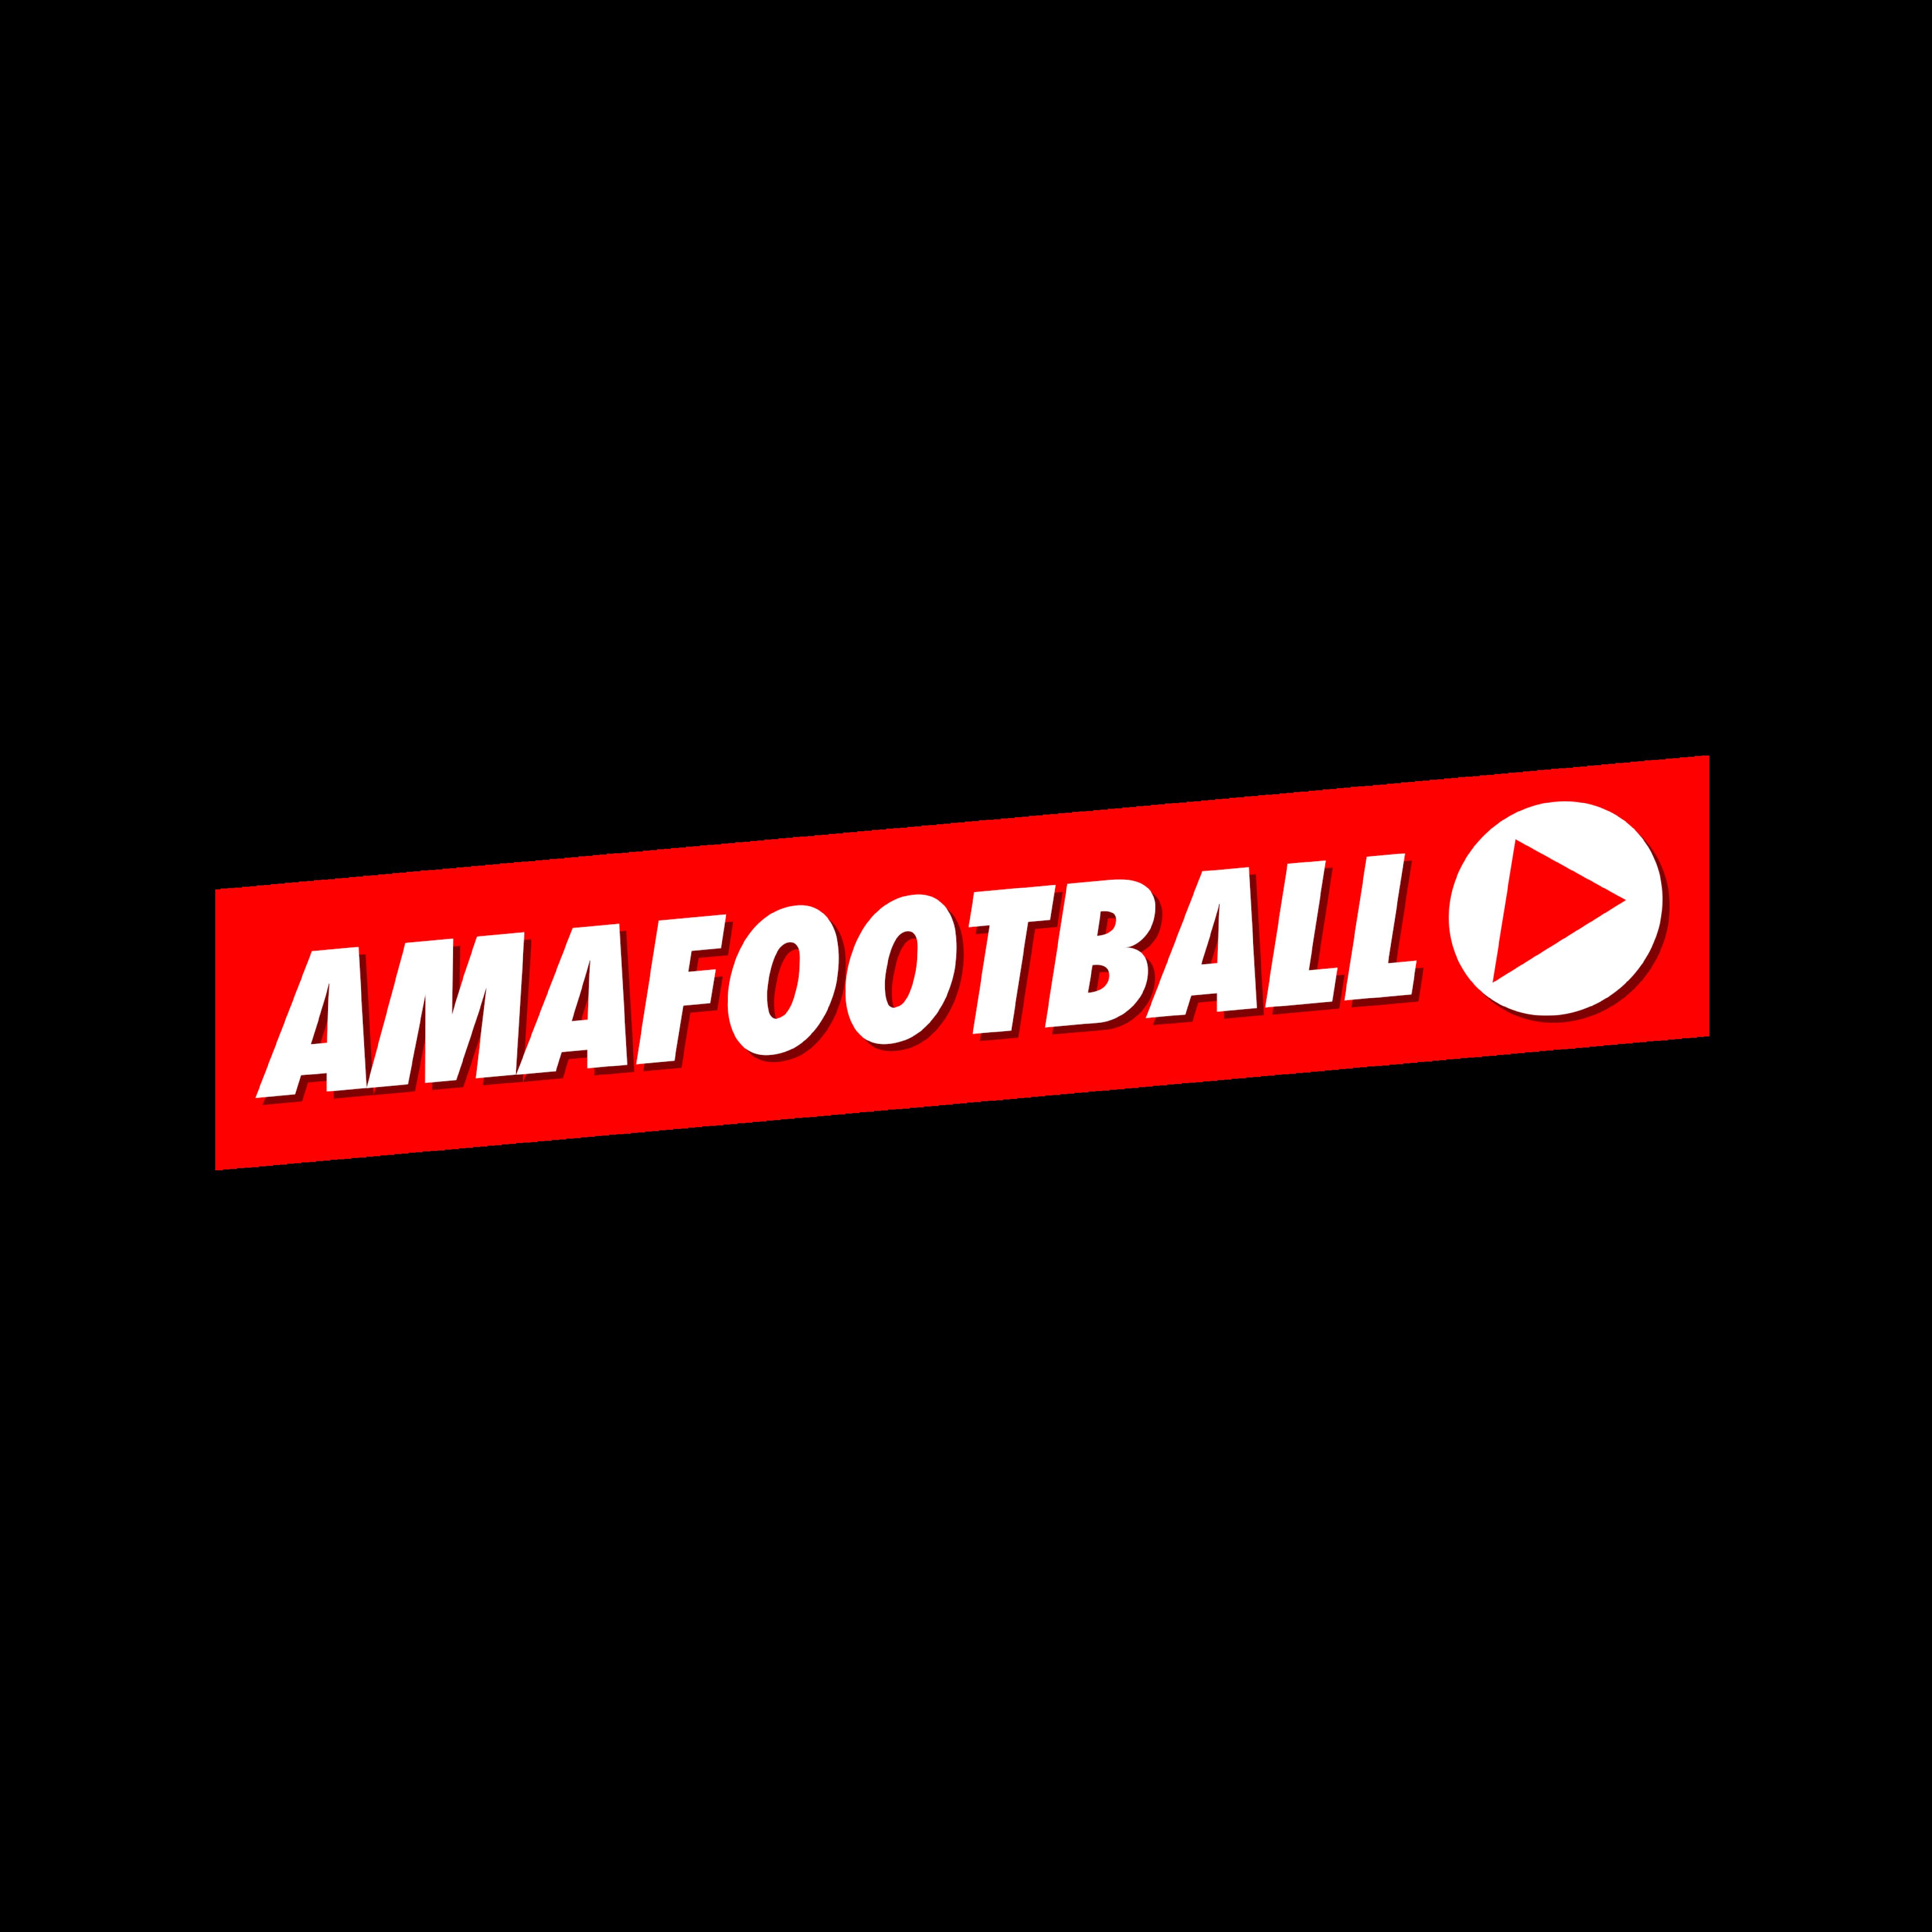 Amafootball